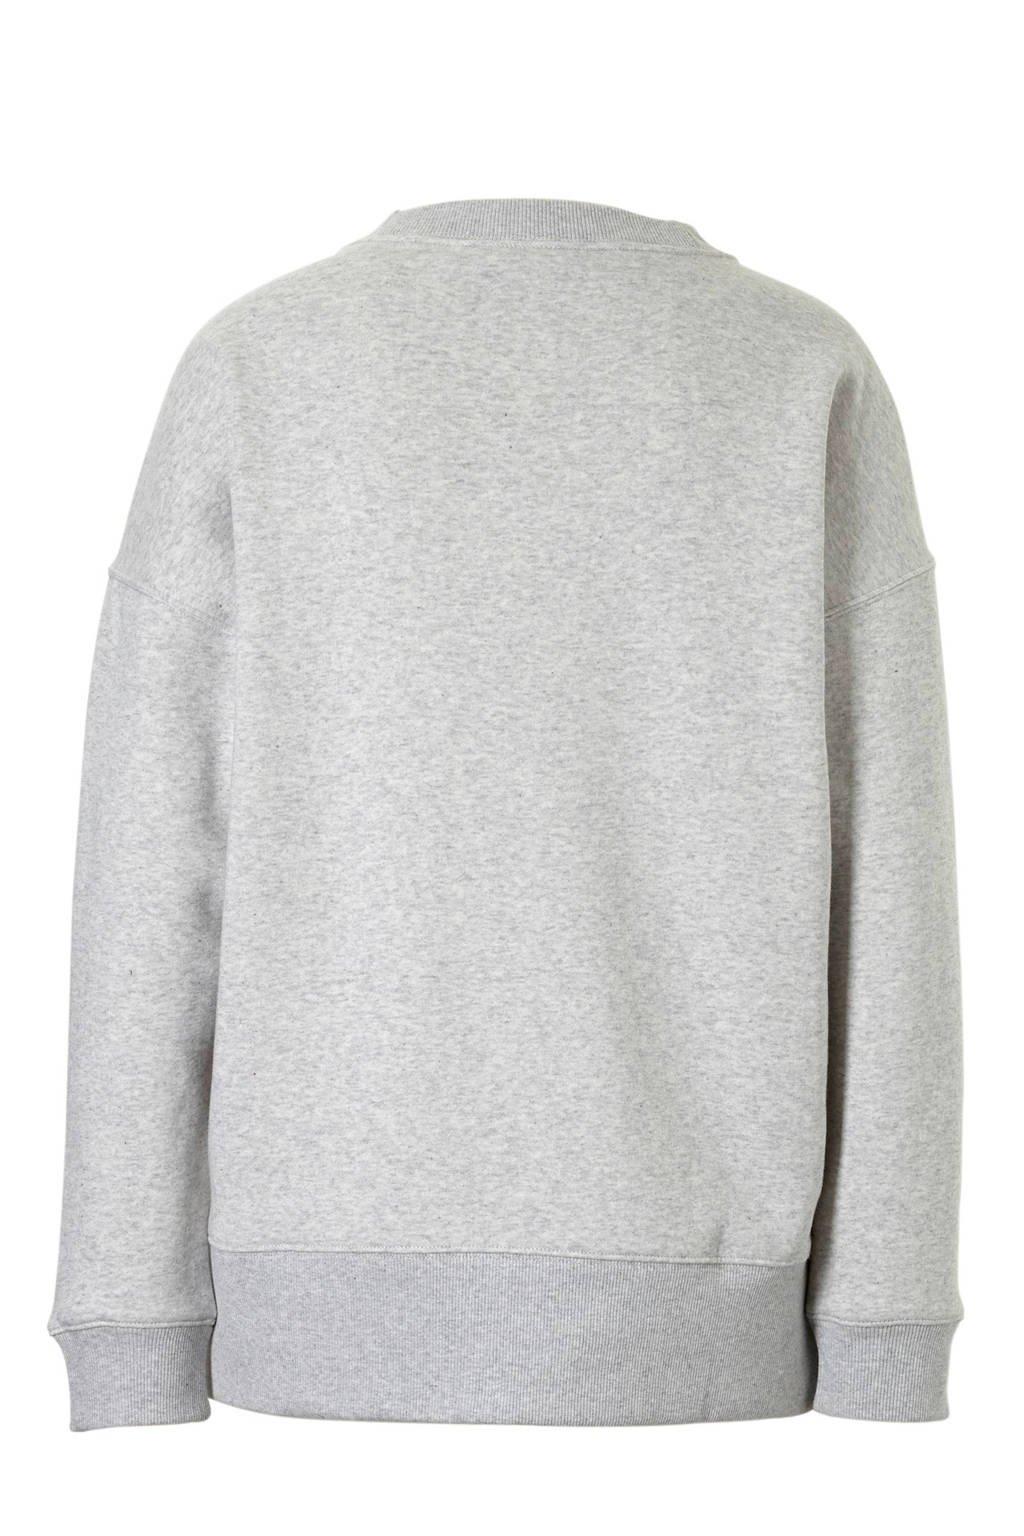 adidas originals sweater grijs, Grijs/wit